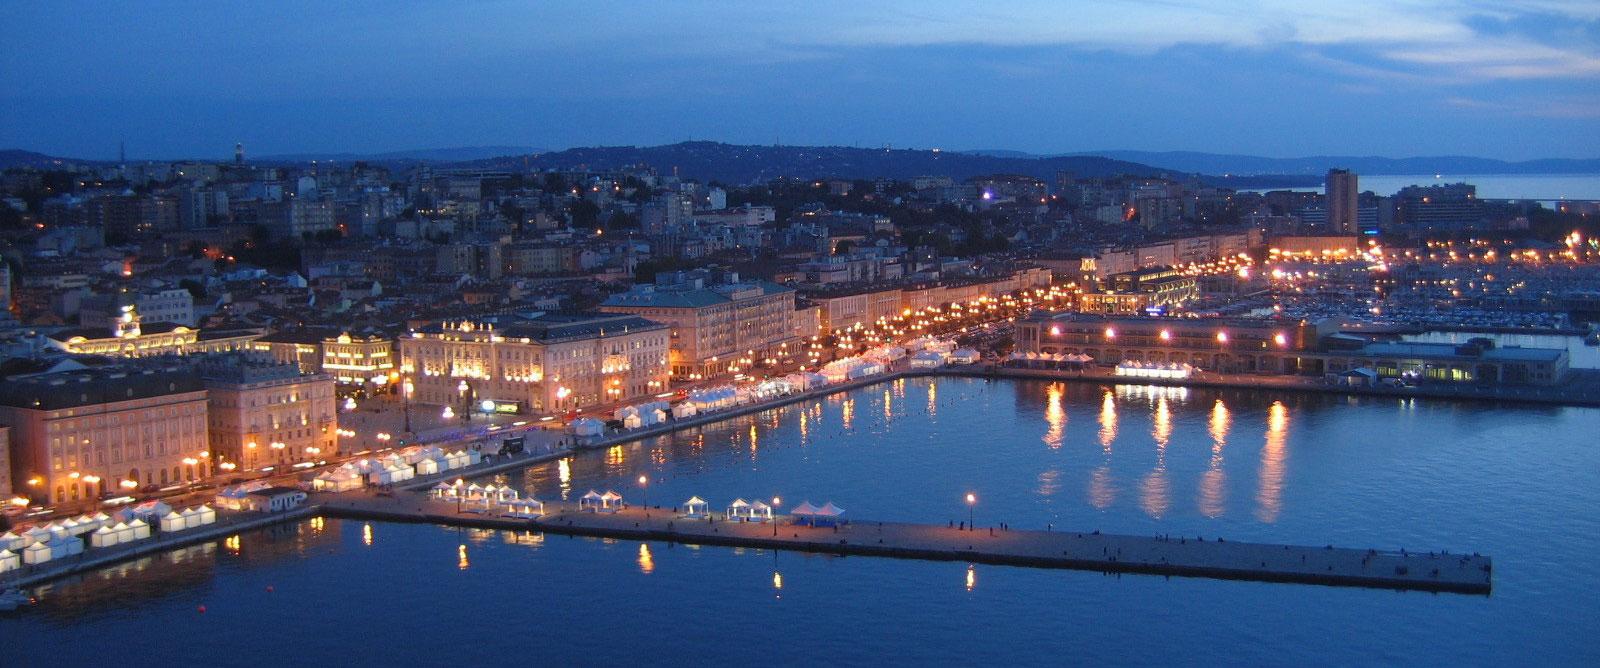 Trieste - Rive, Barcolana 5 ottobre 2015